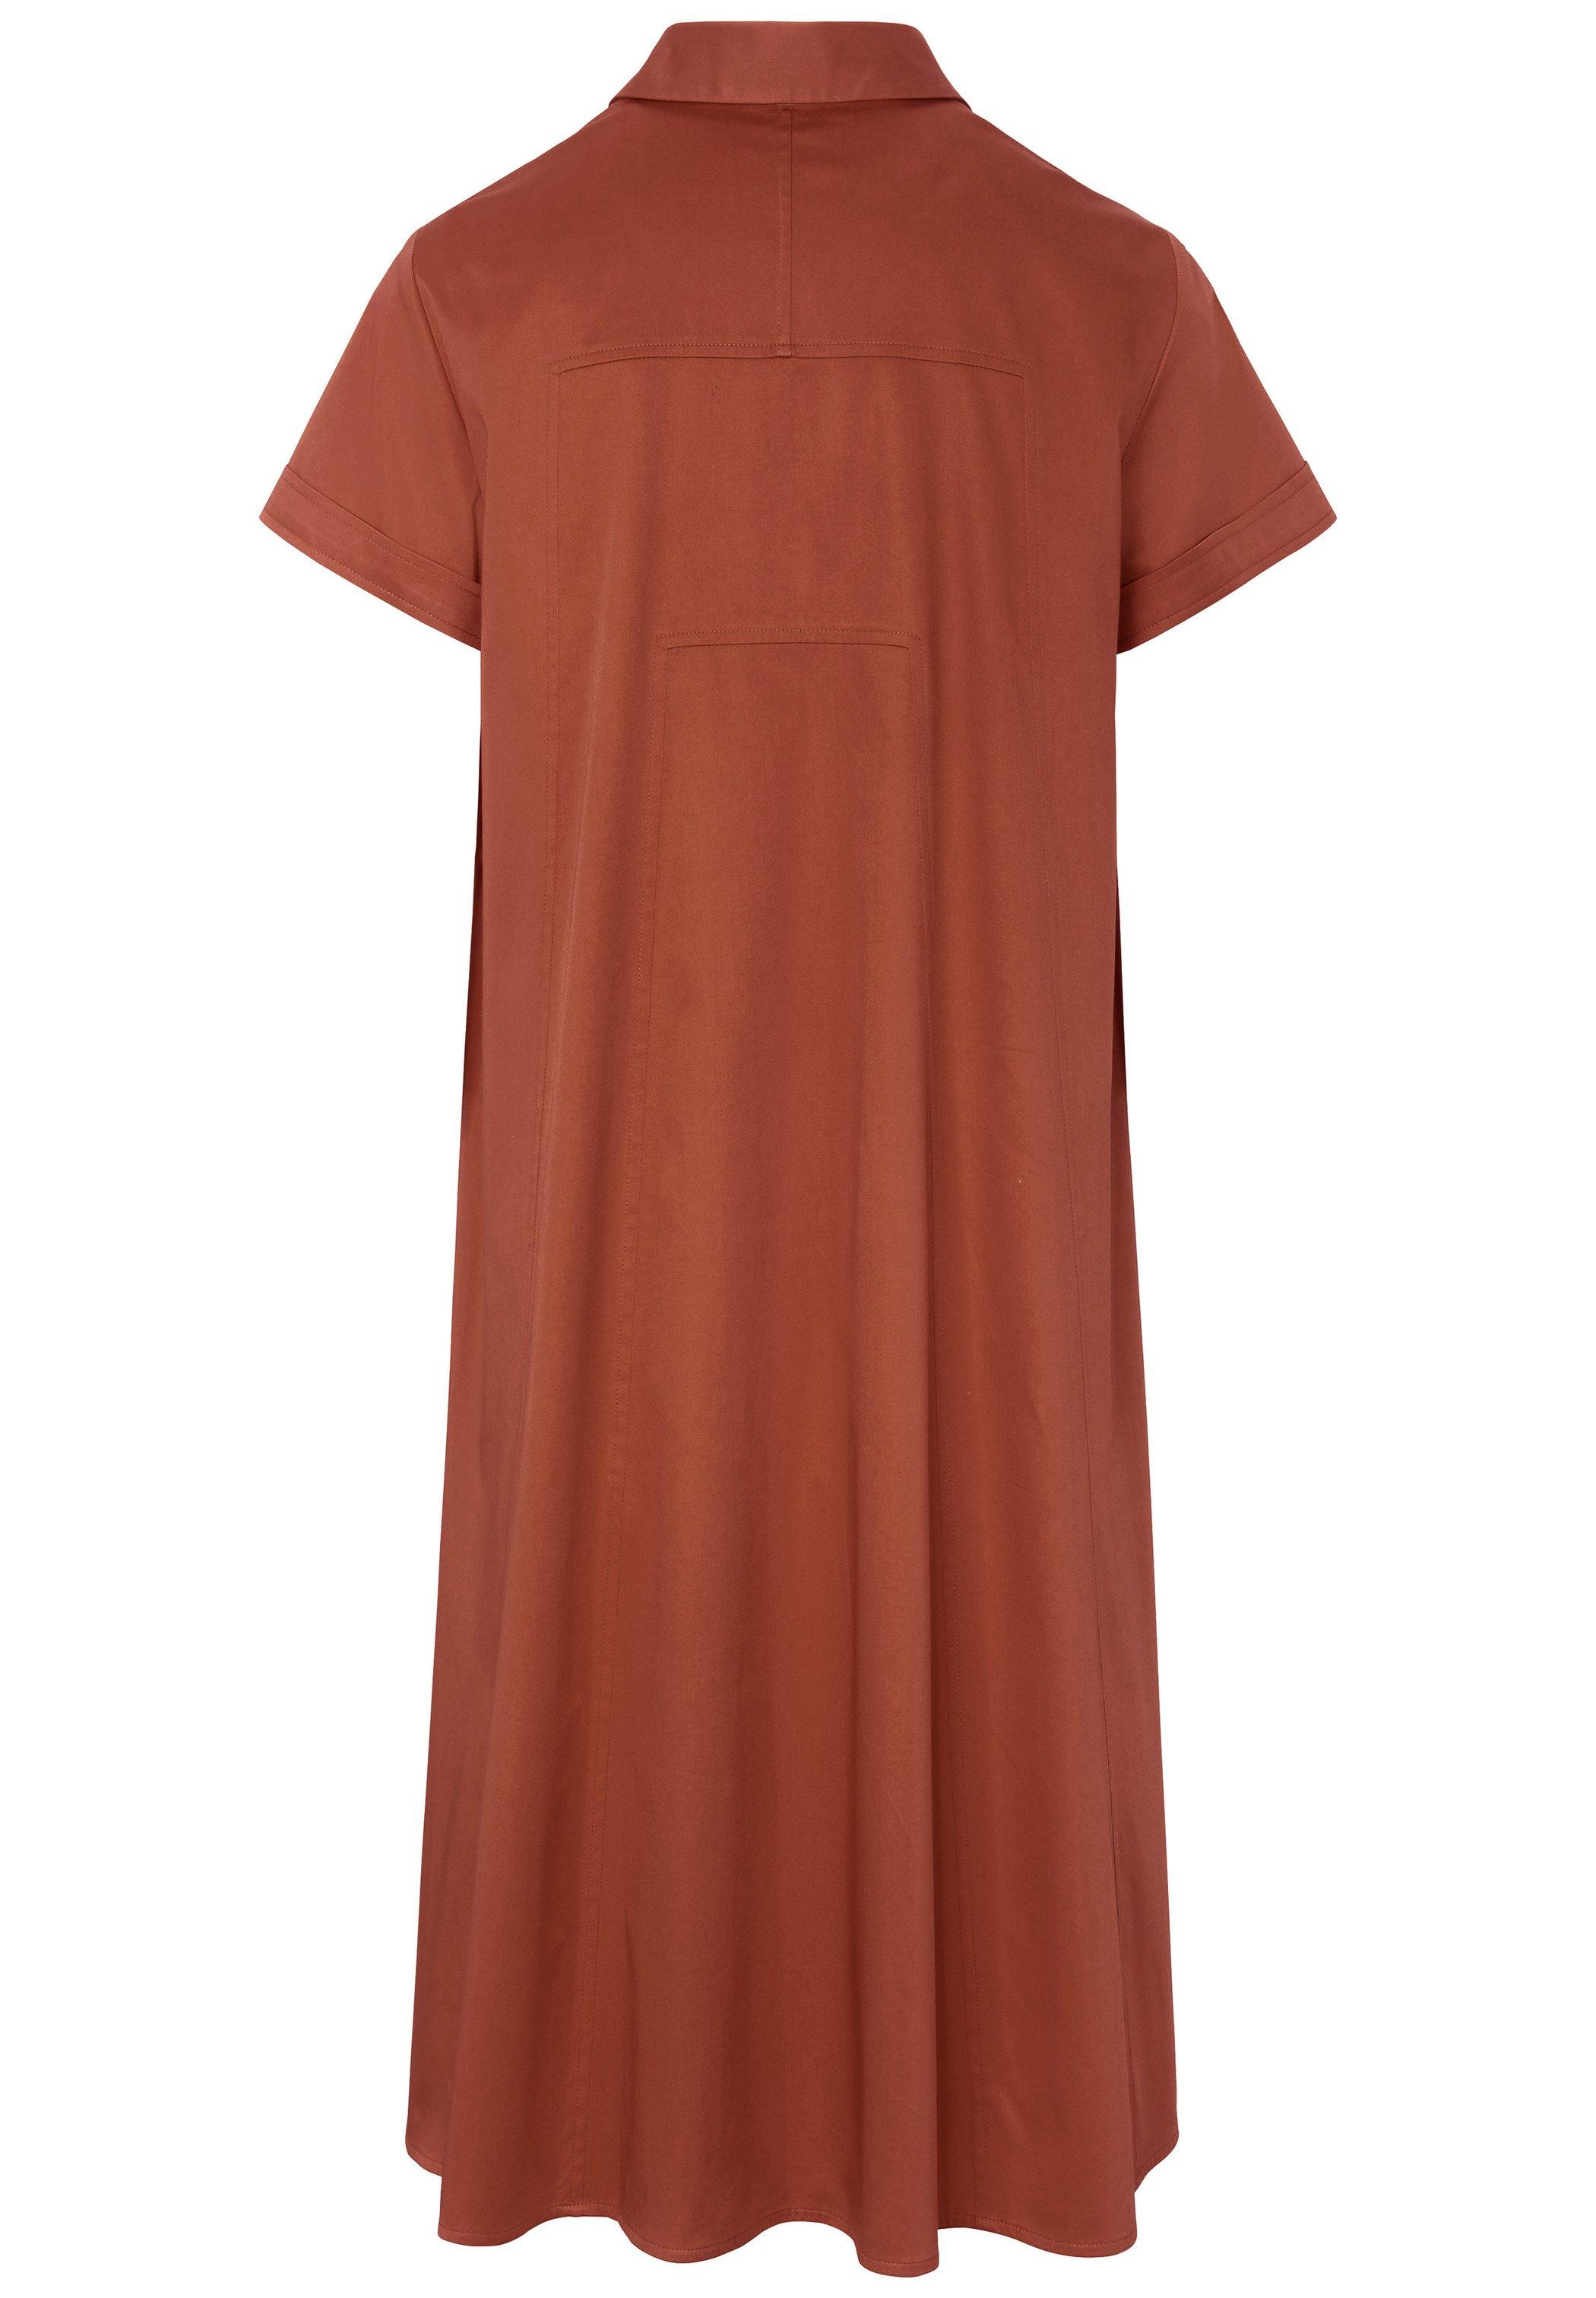 DAY.LIKE Robe chemise - cognac - Robes femme wZPWa